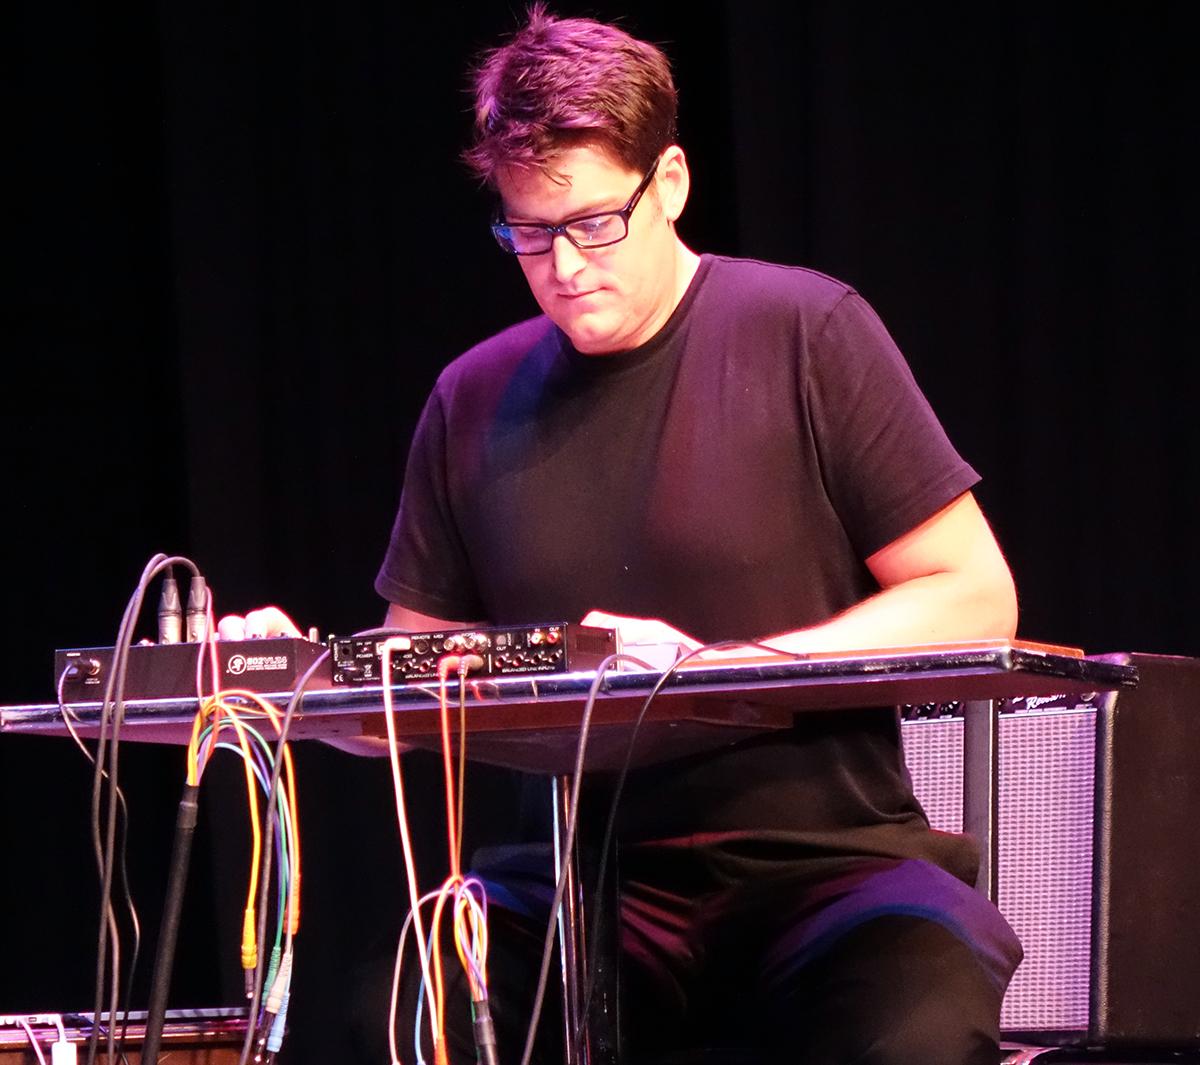 Sam Pluta at Guelph Jazz Festival 2015